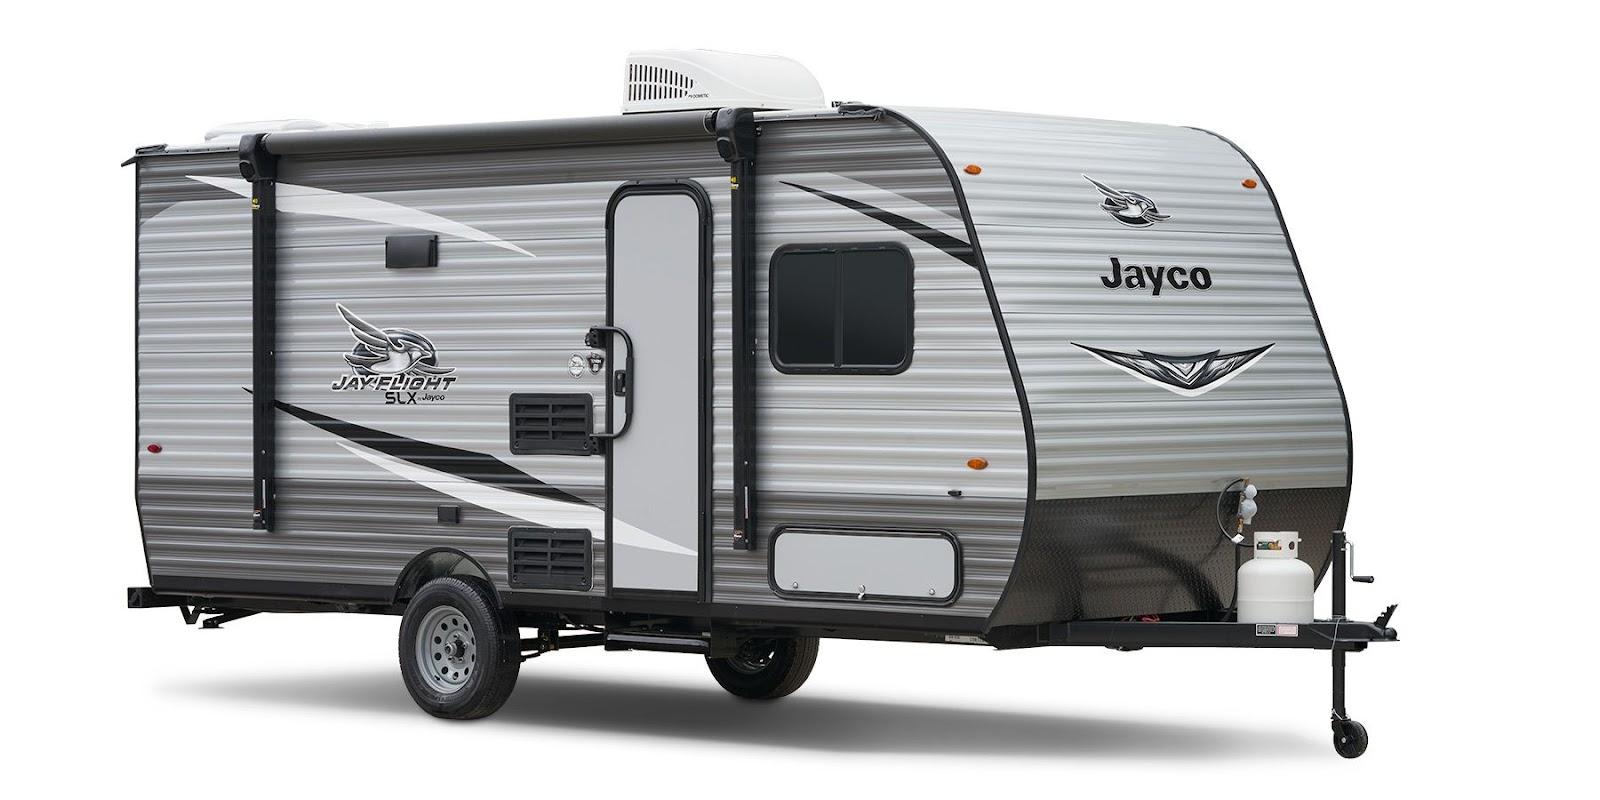 jayco lightweight camper jayflight slx 7